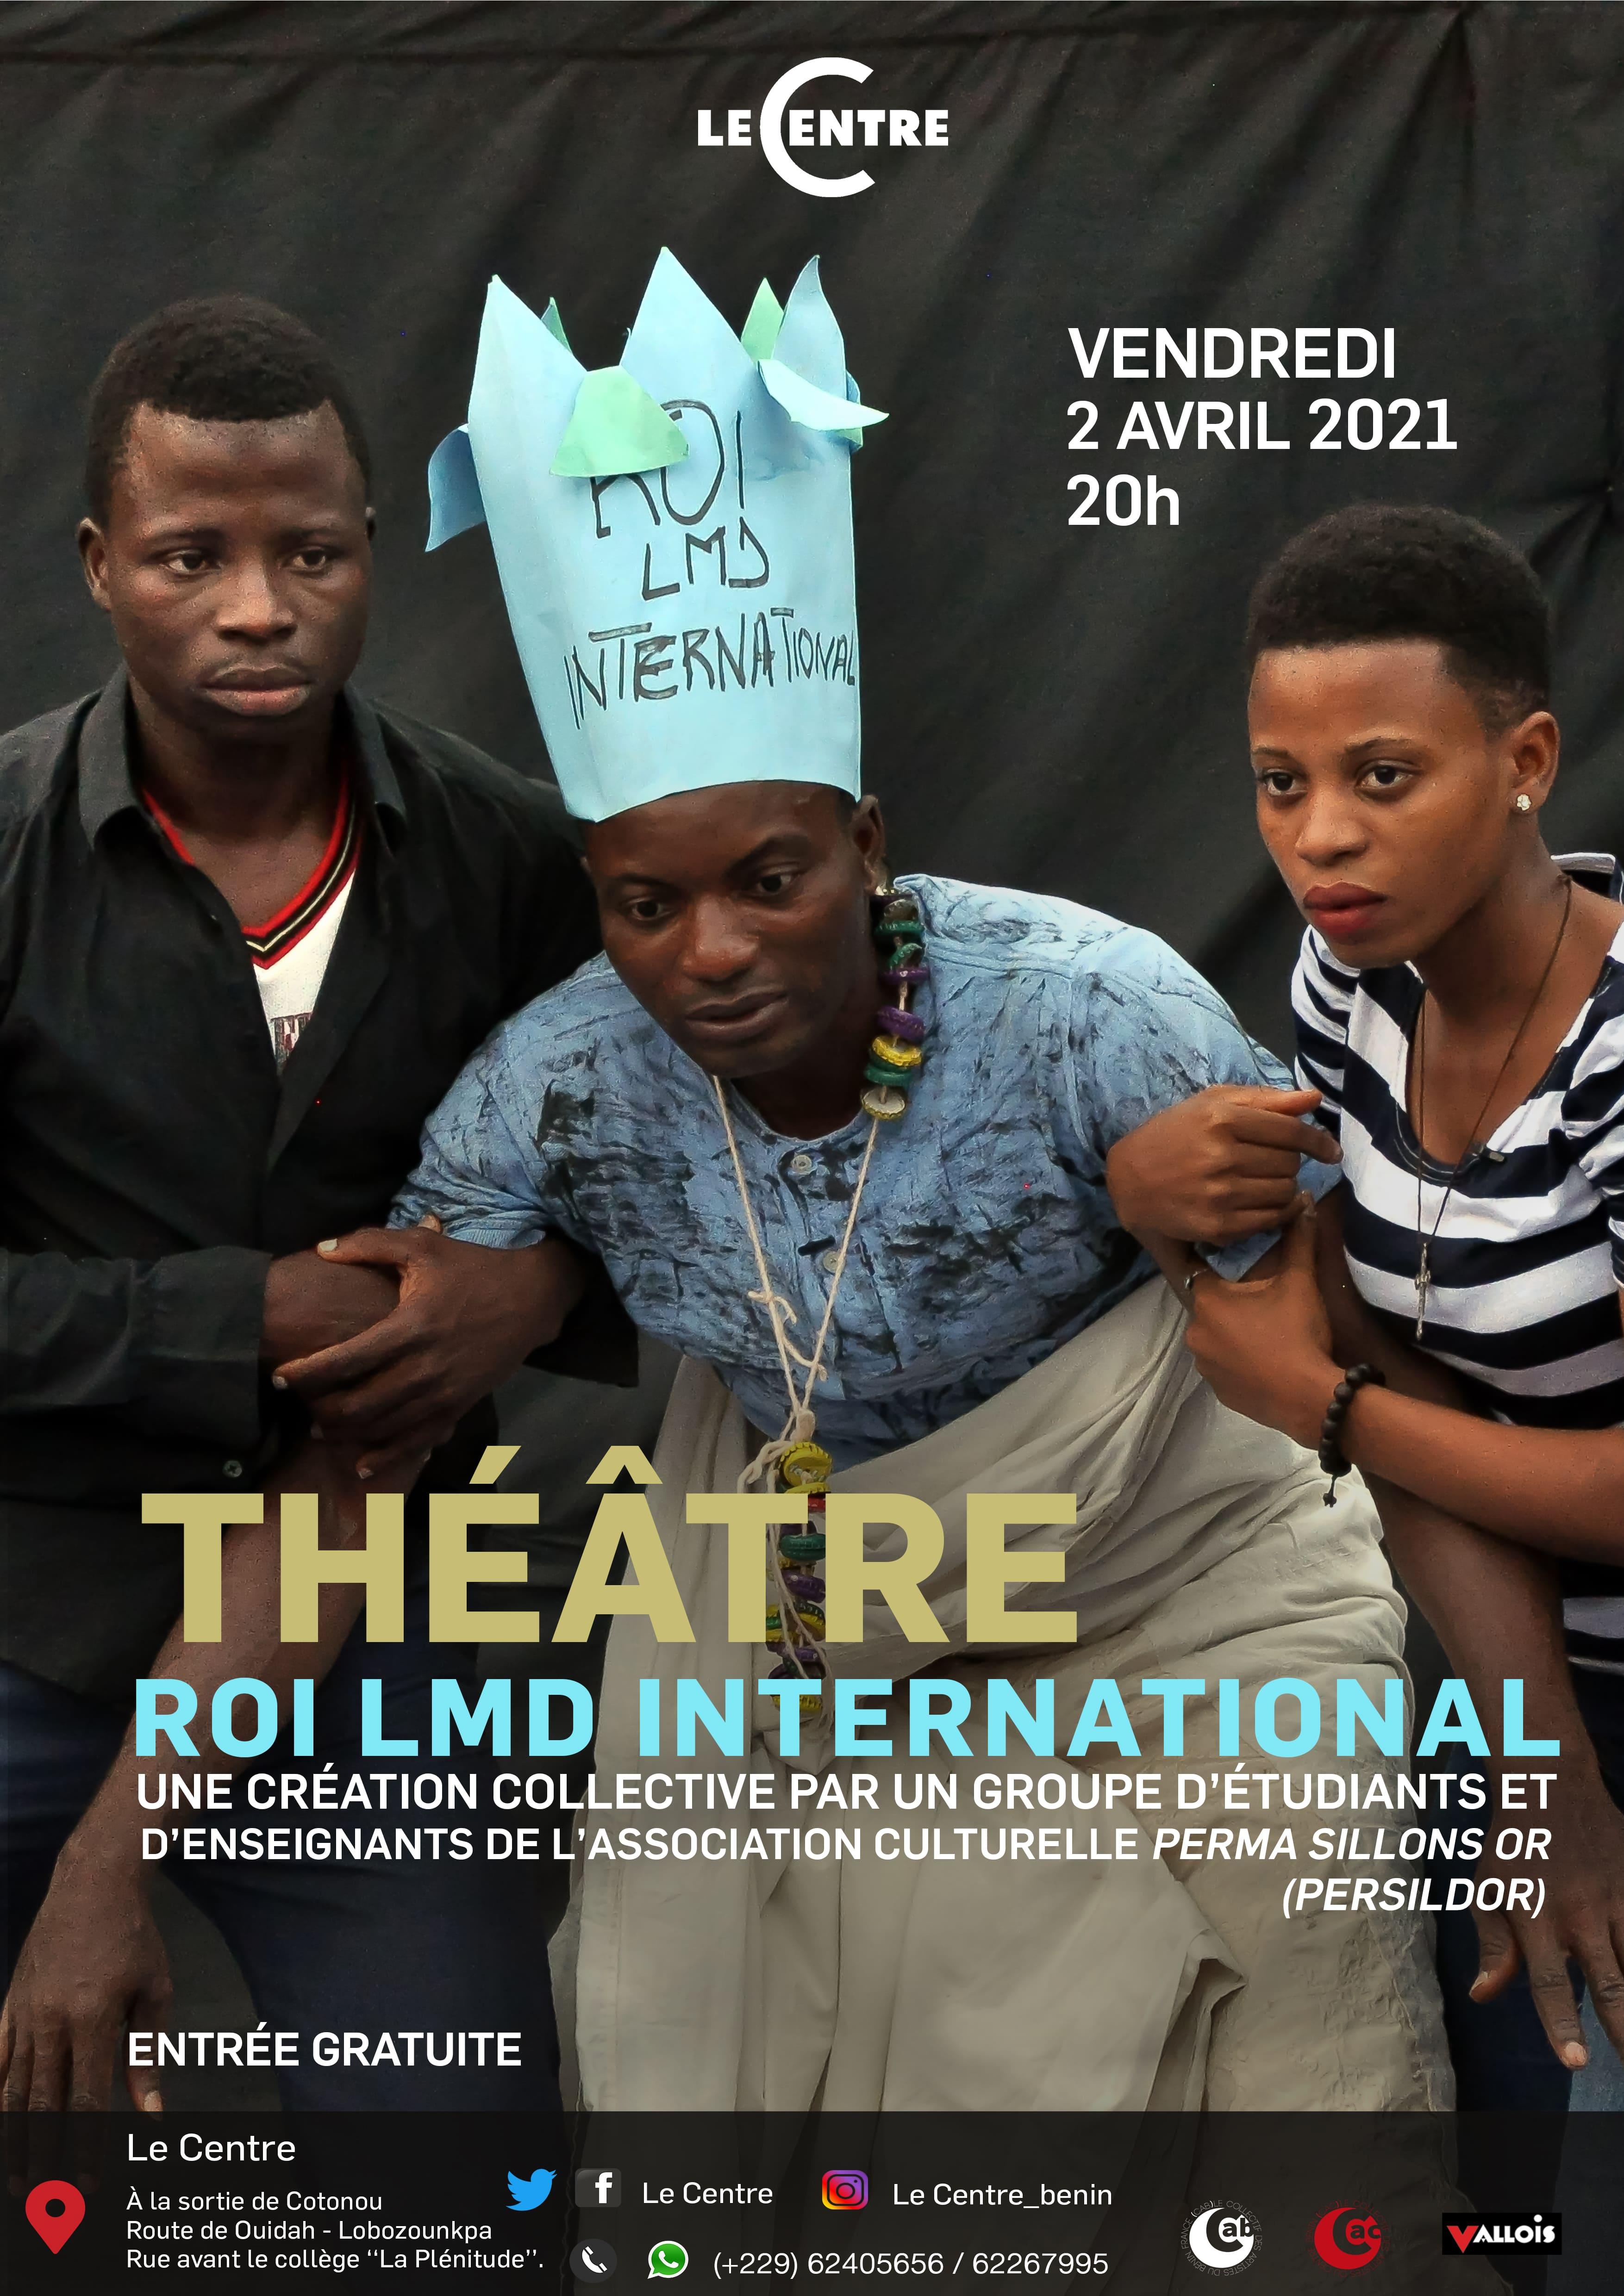 Théâtre , Roi LMD International